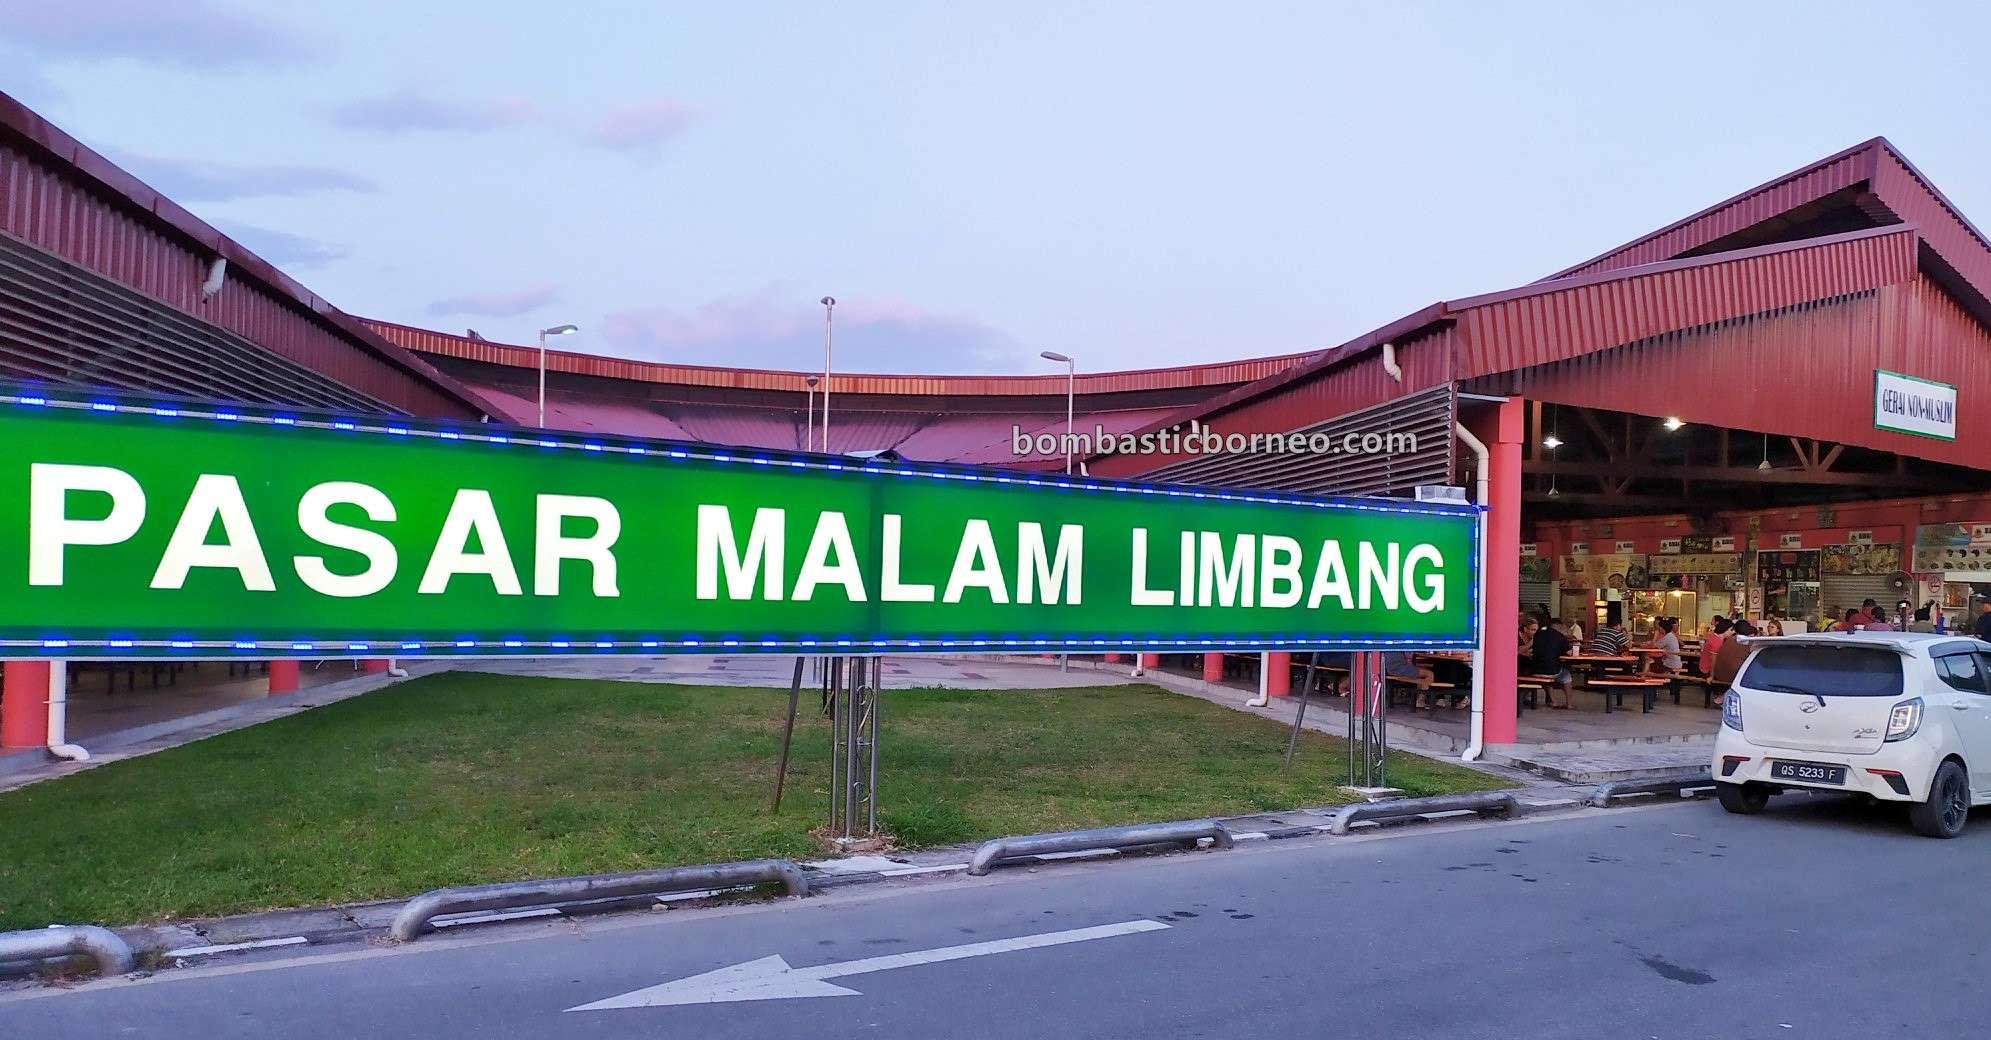 town, tarikan pelancong, food court, local market, backpackers, exploration, Tourism, tourist attraction, Cross Border, Borneo, 马来西亚砂拉越, 林梦旅游景点,